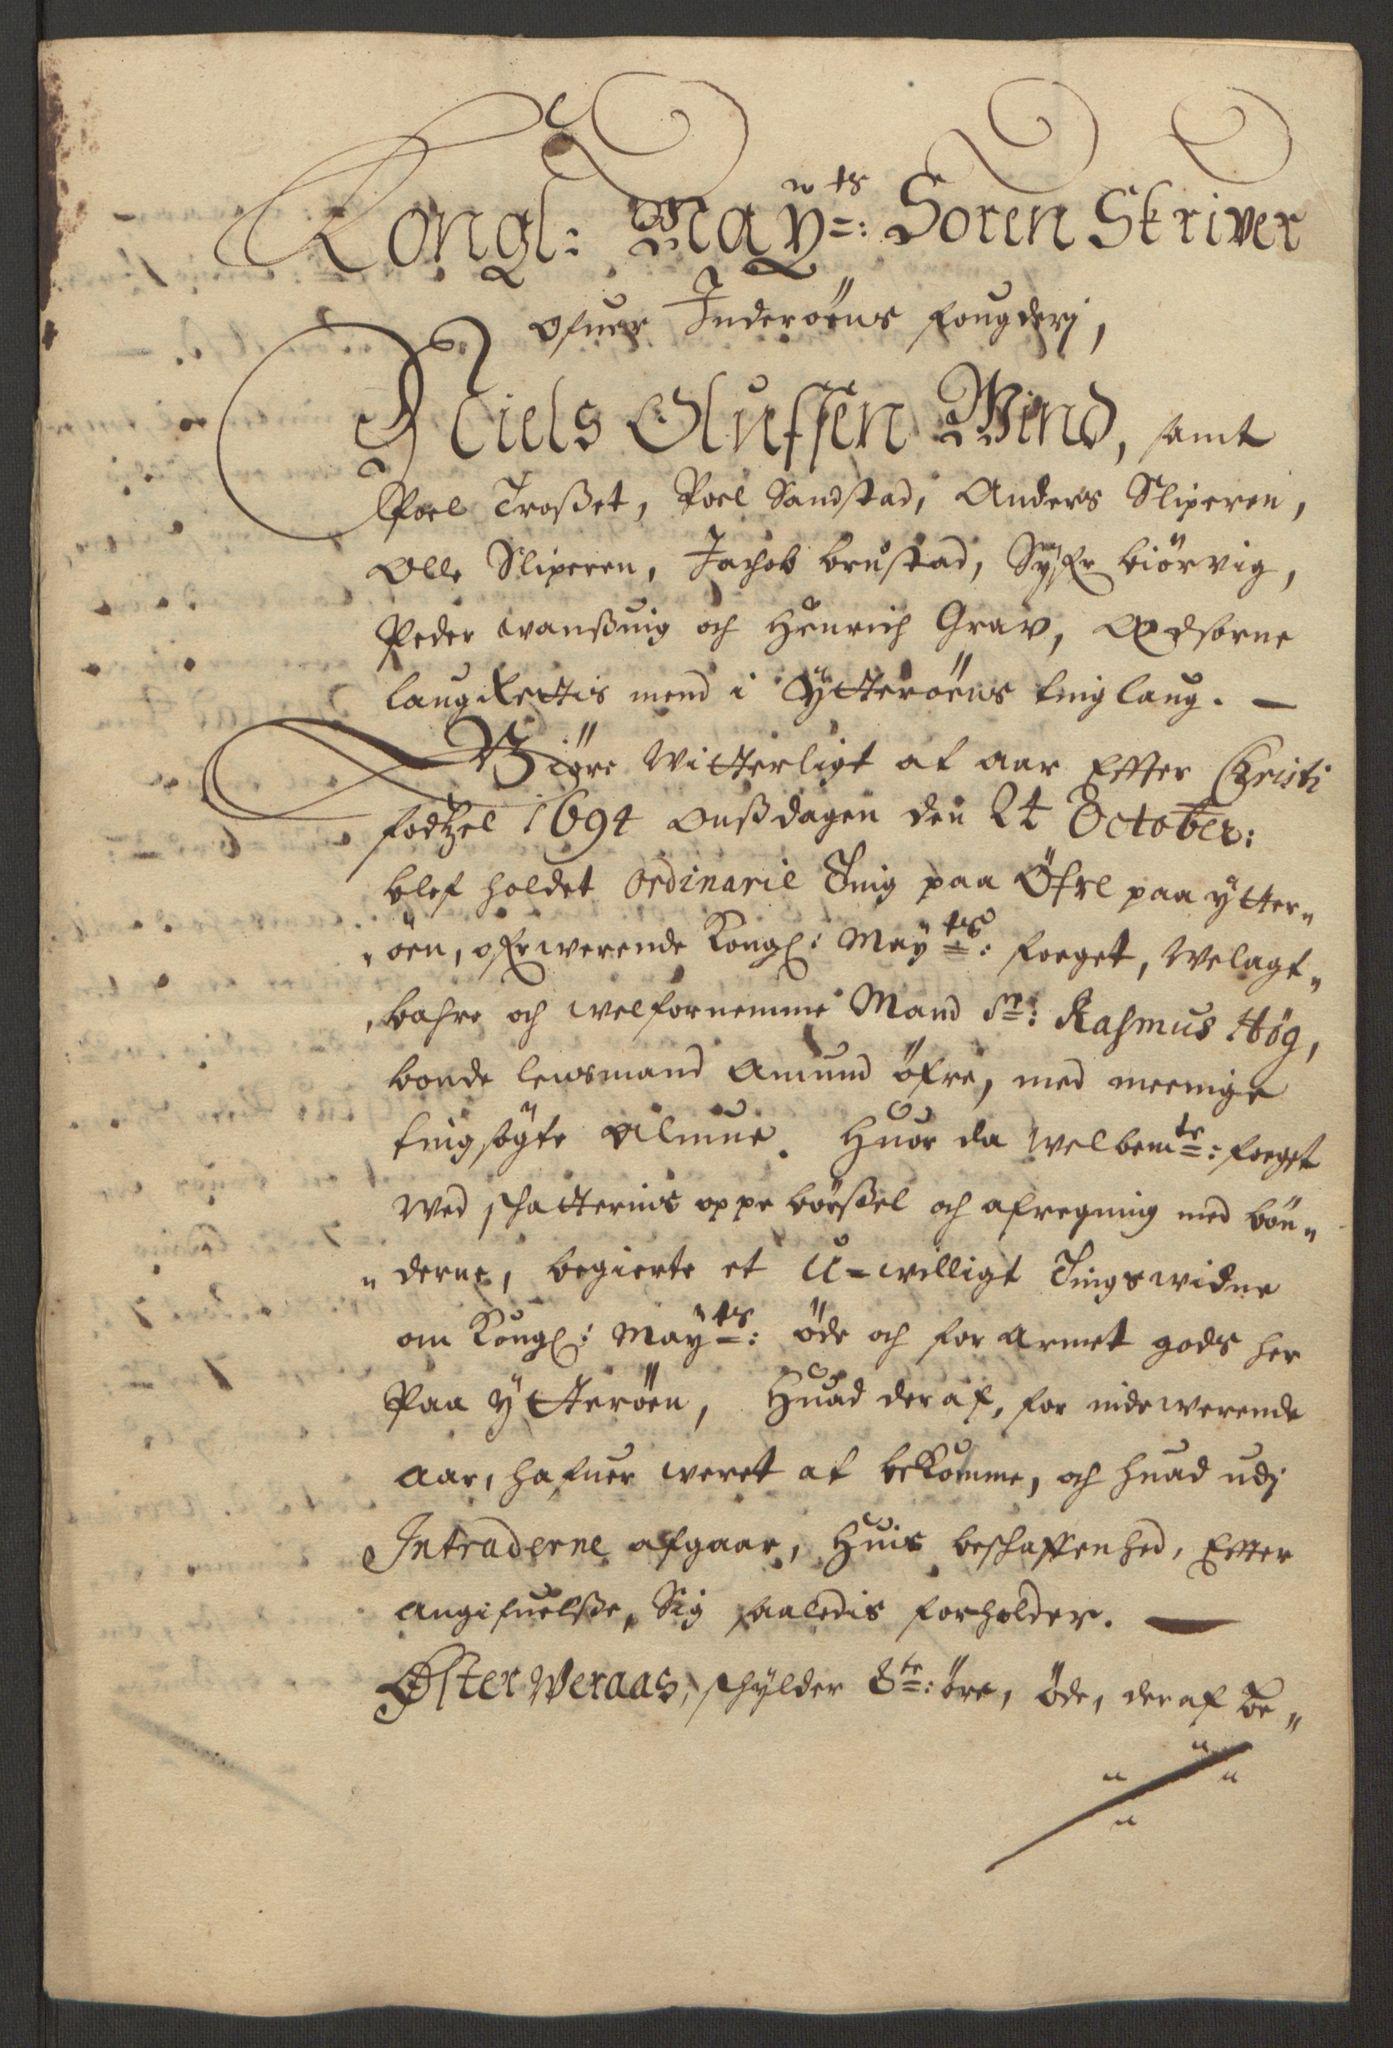 RA, Rentekammeret inntil 1814, Reviderte regnskaper, Fogderegnskap, R63/L4308: Fogderegnskap Inderøy, 1692-1694, s. 620